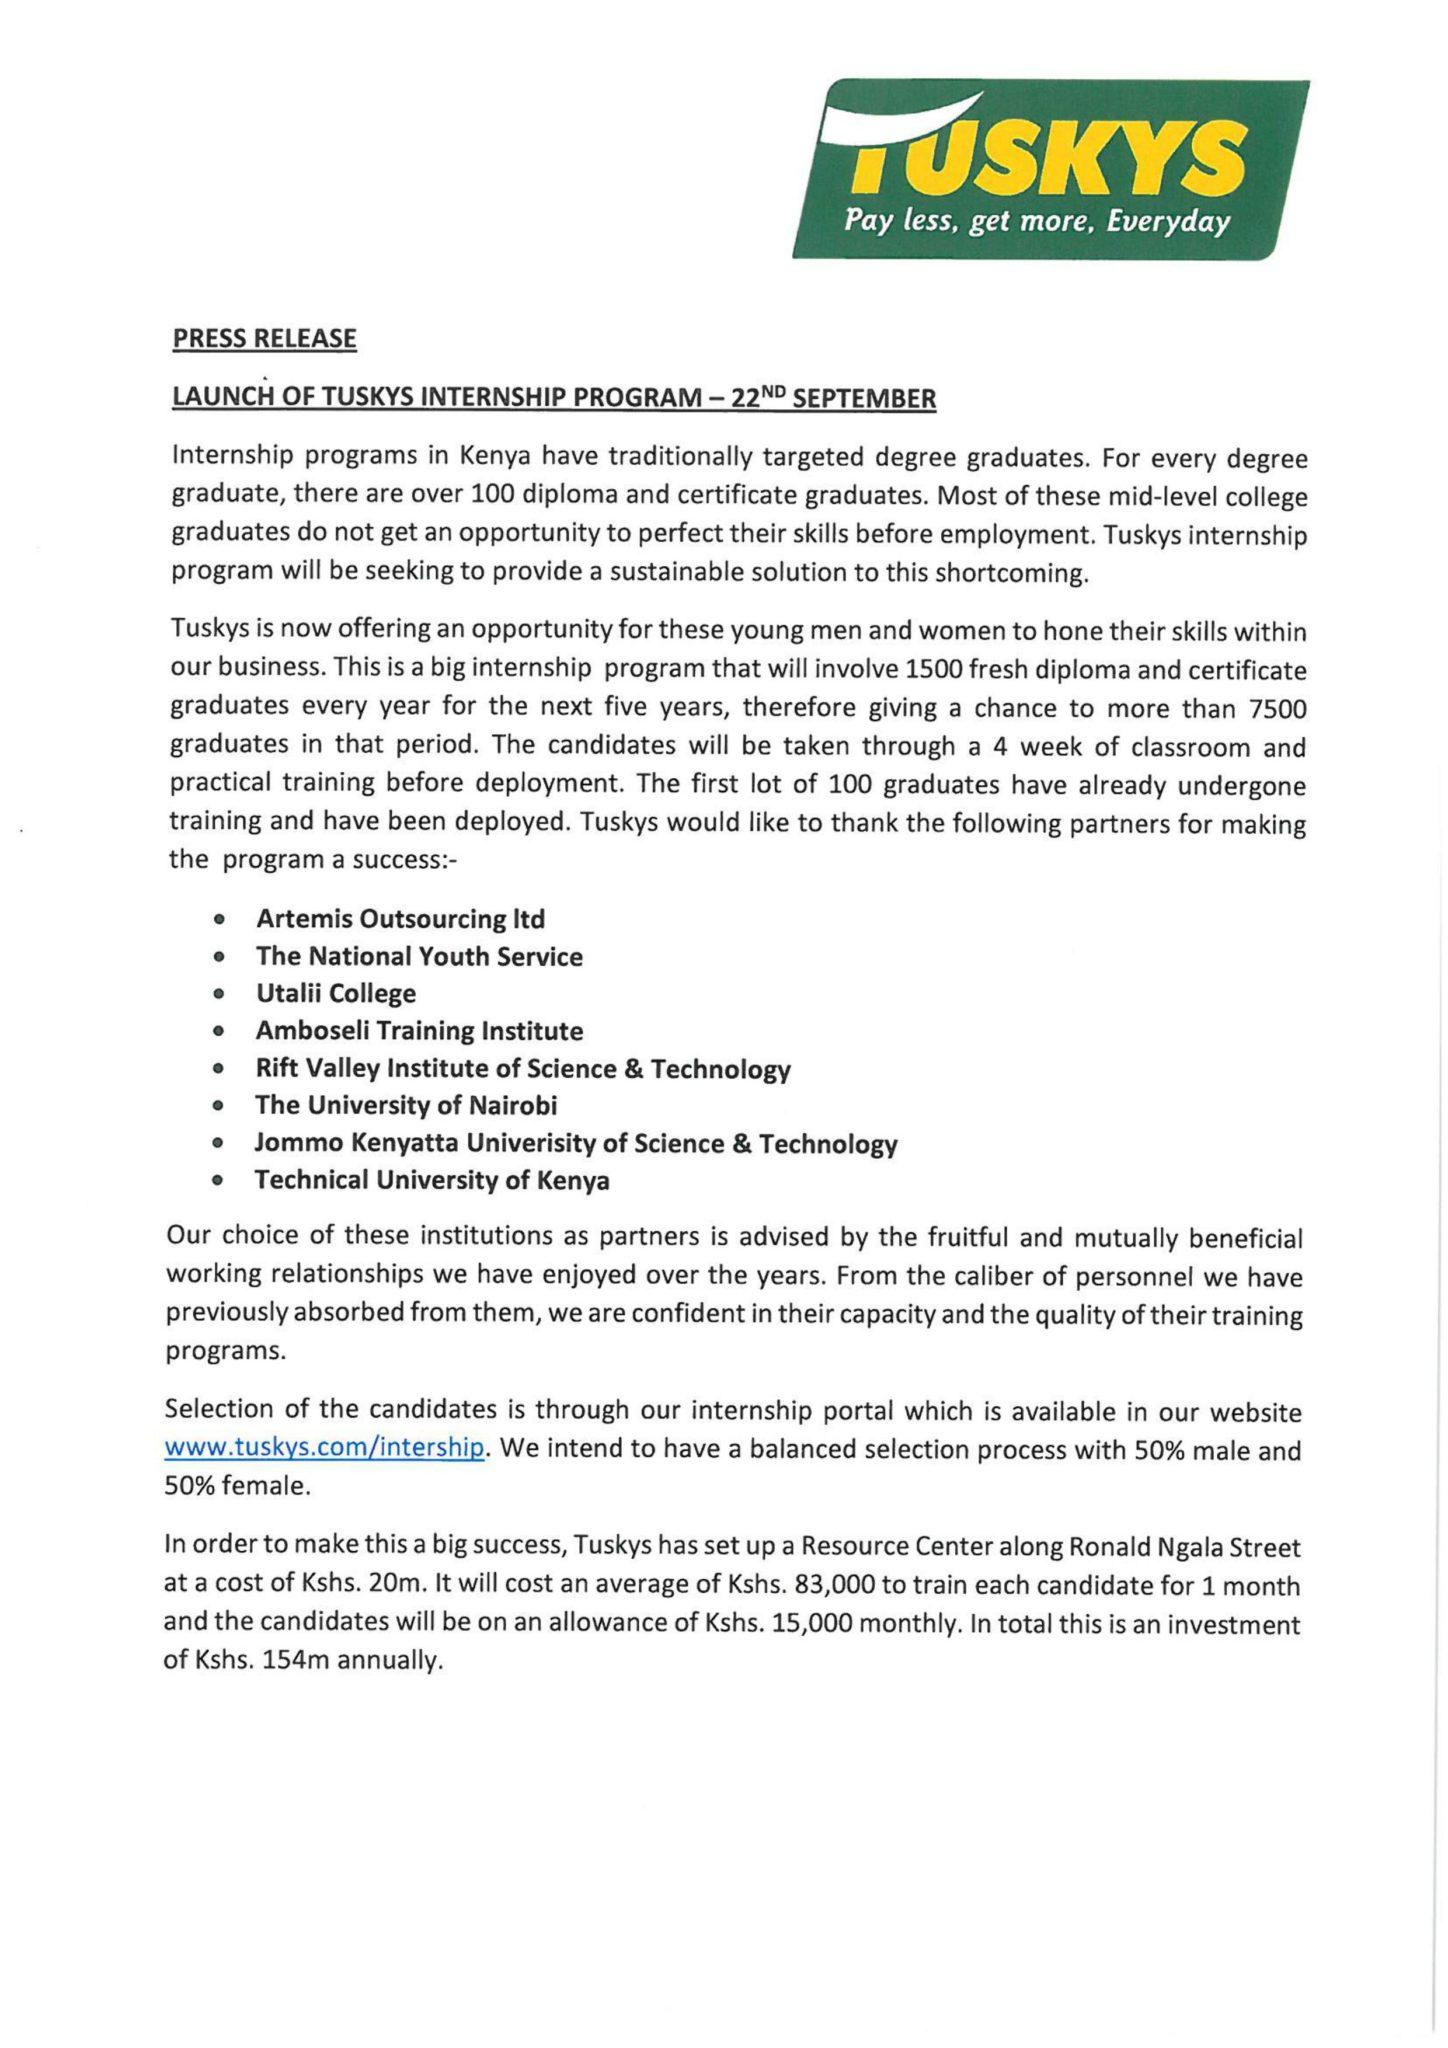 tuskys internship program - Soko Directory